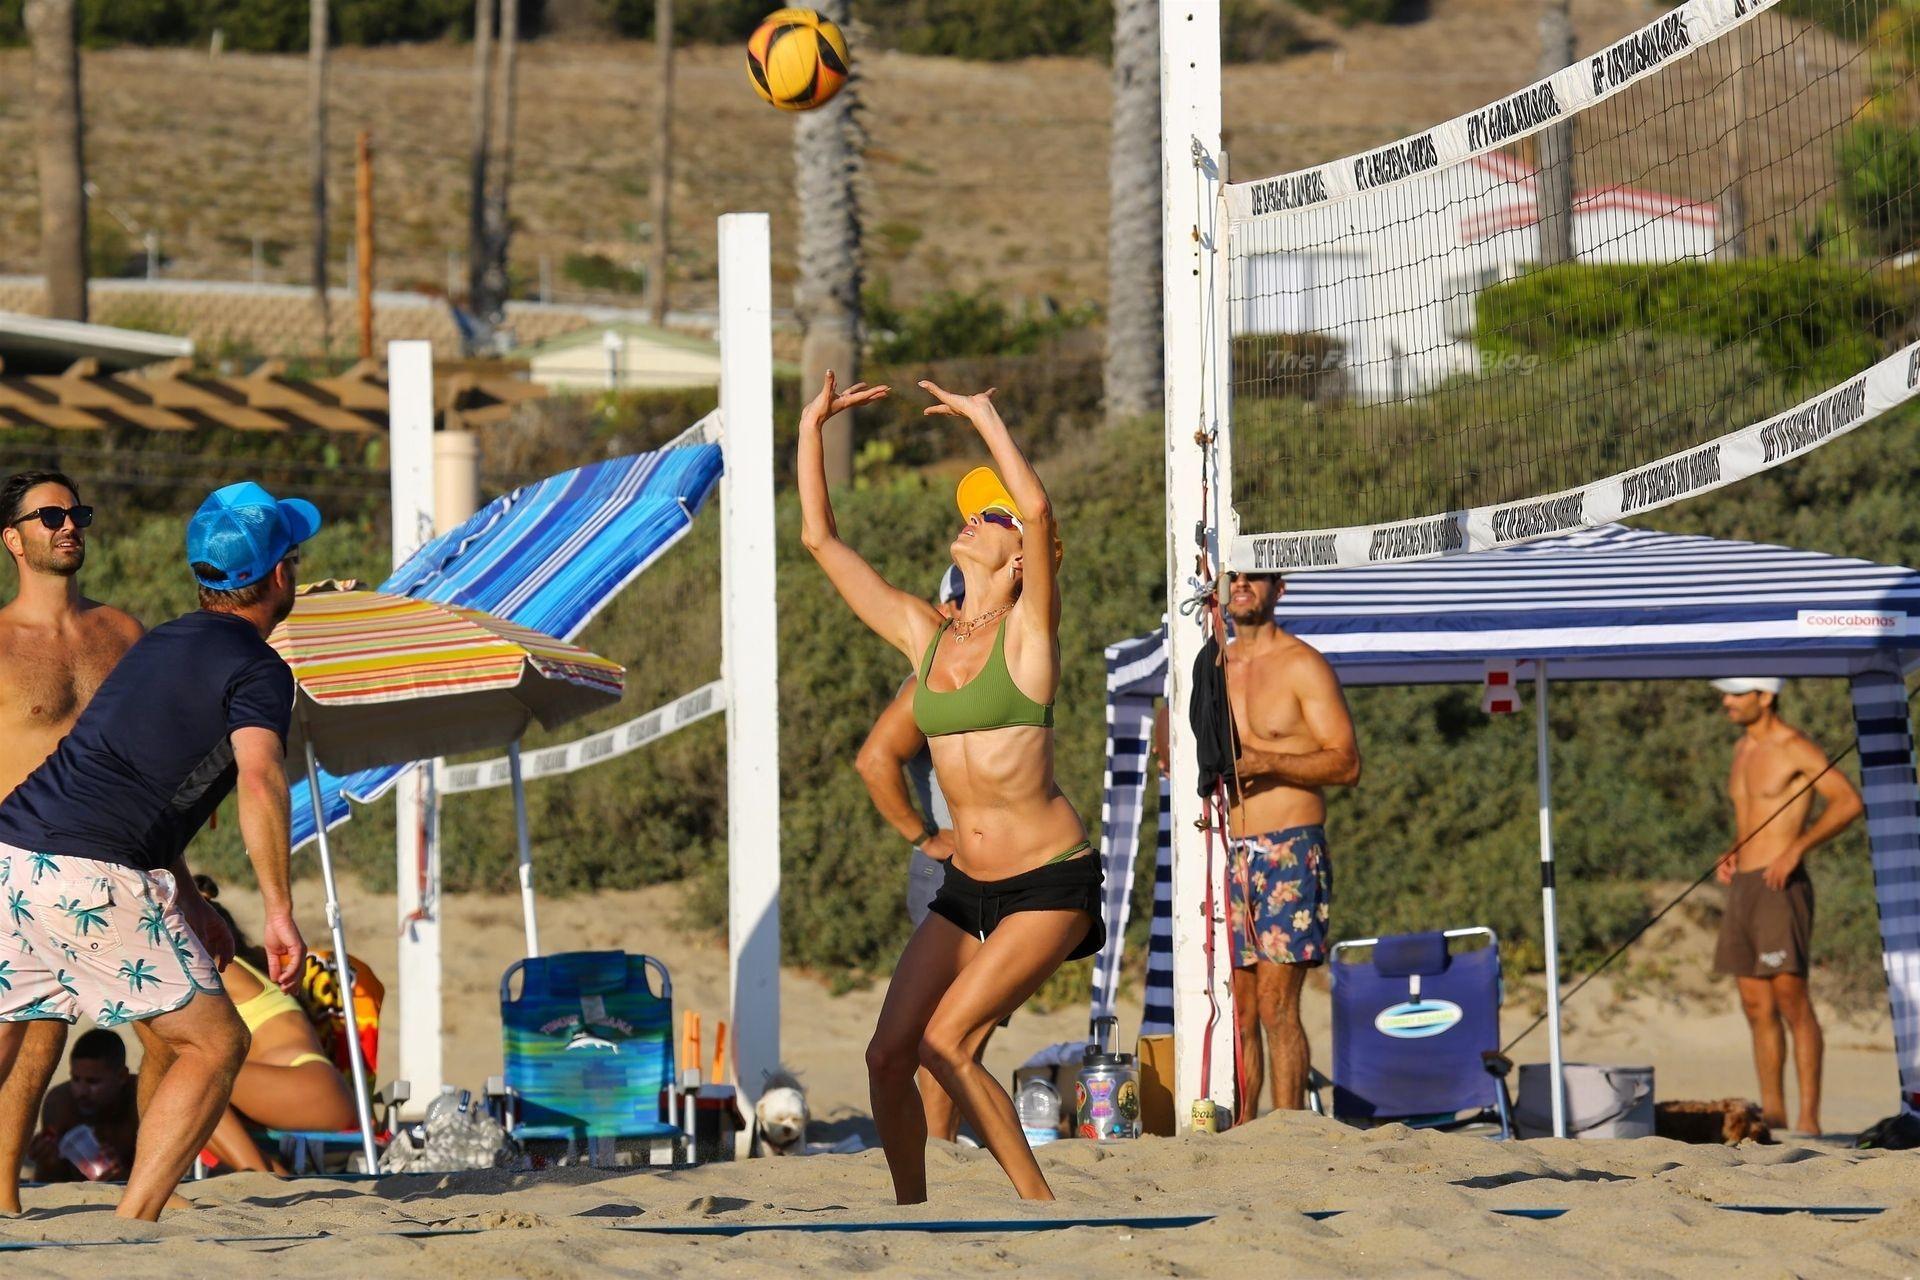 Alessandra Ambrosio Sexy on Beach 91